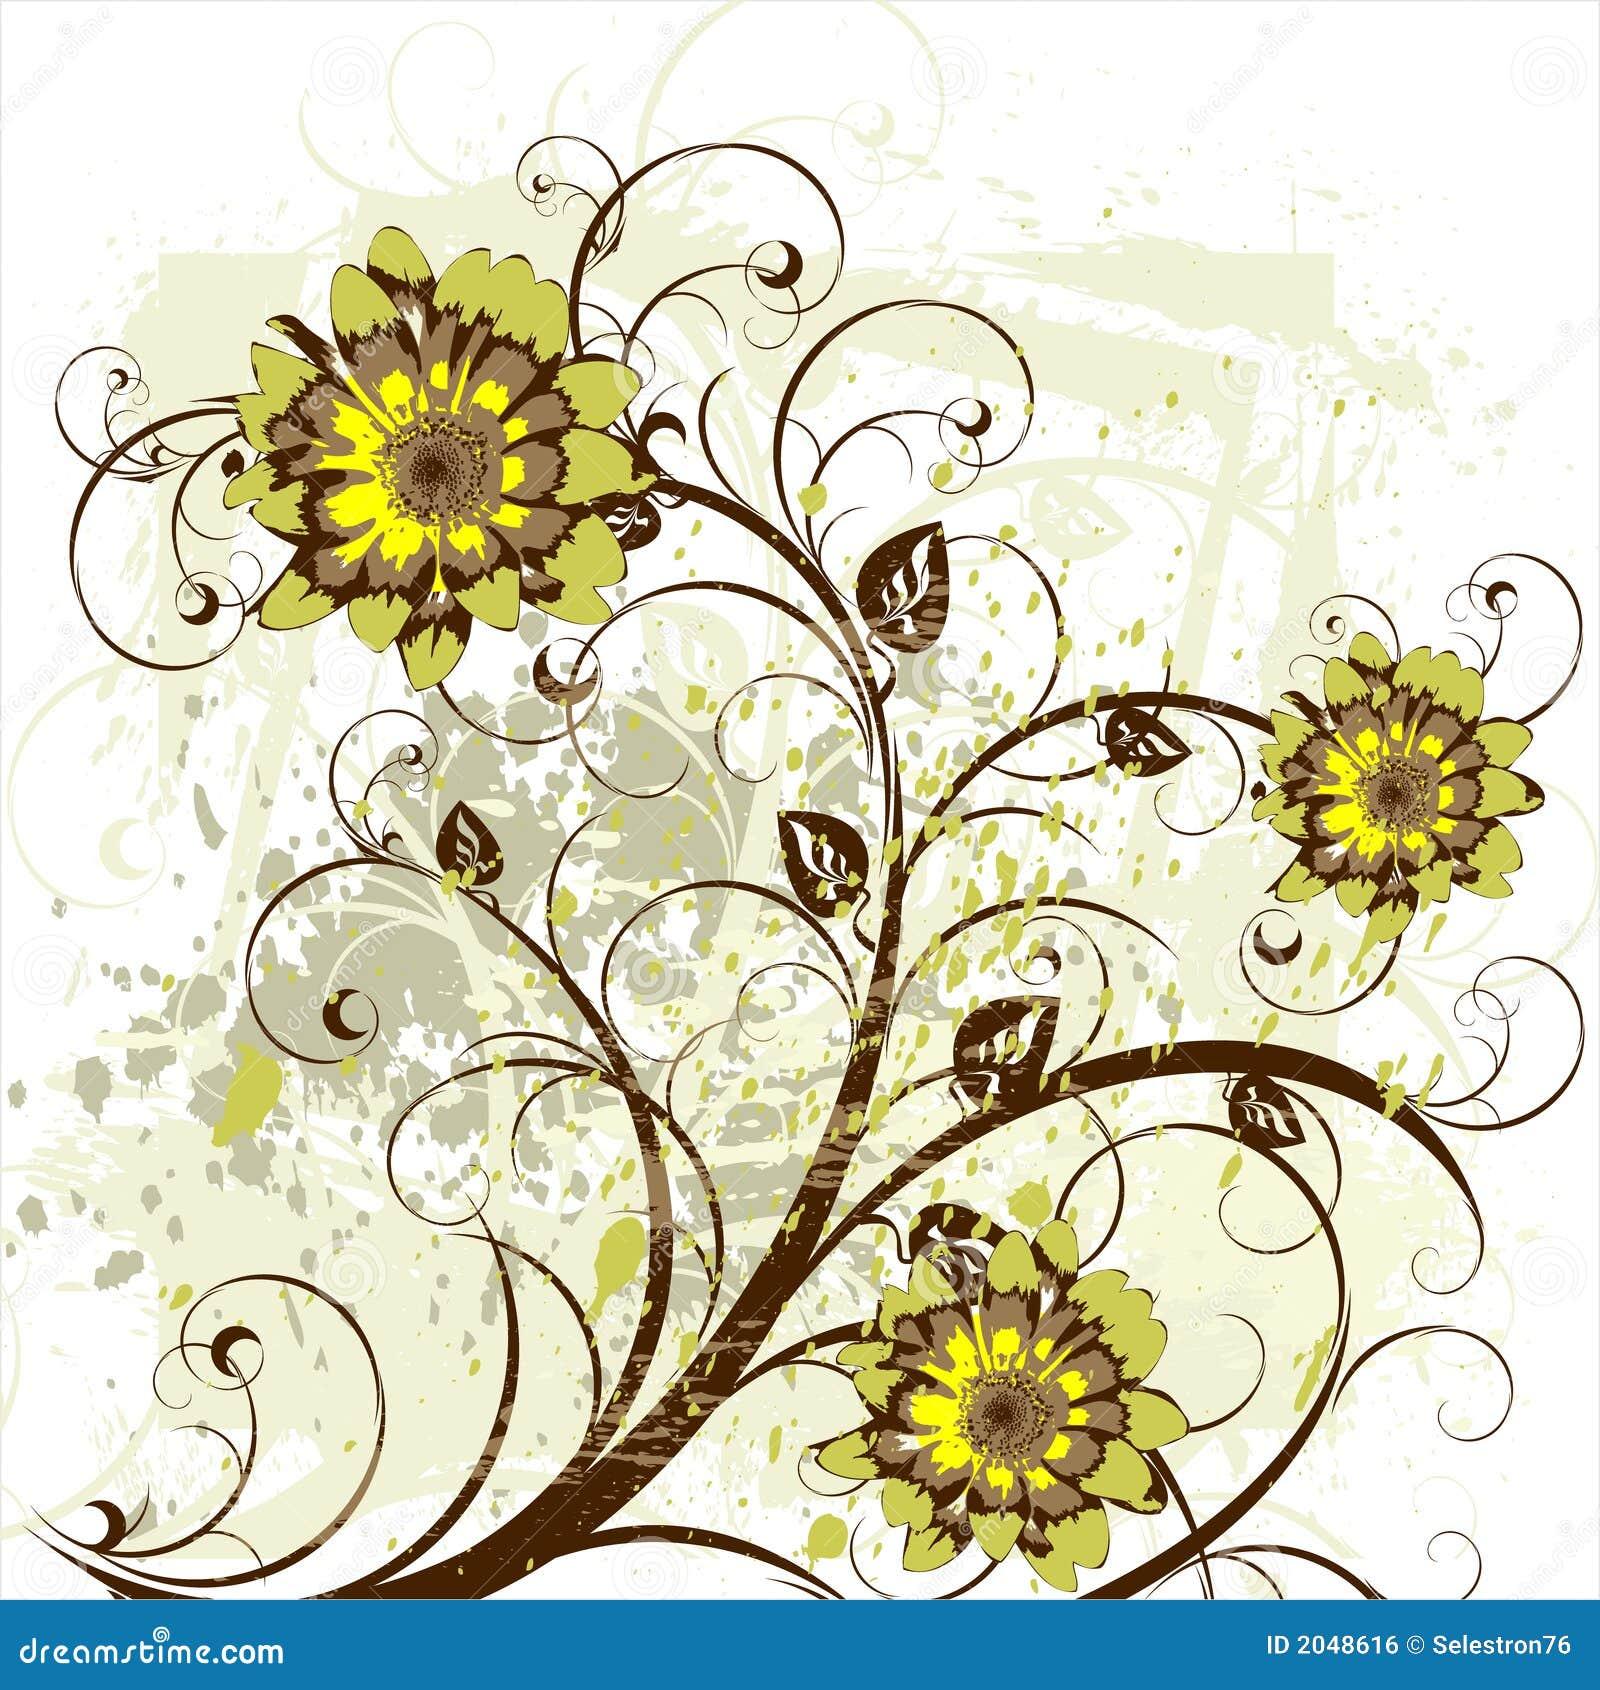 Flowers Decor On Grunge Background Stock Vector ...